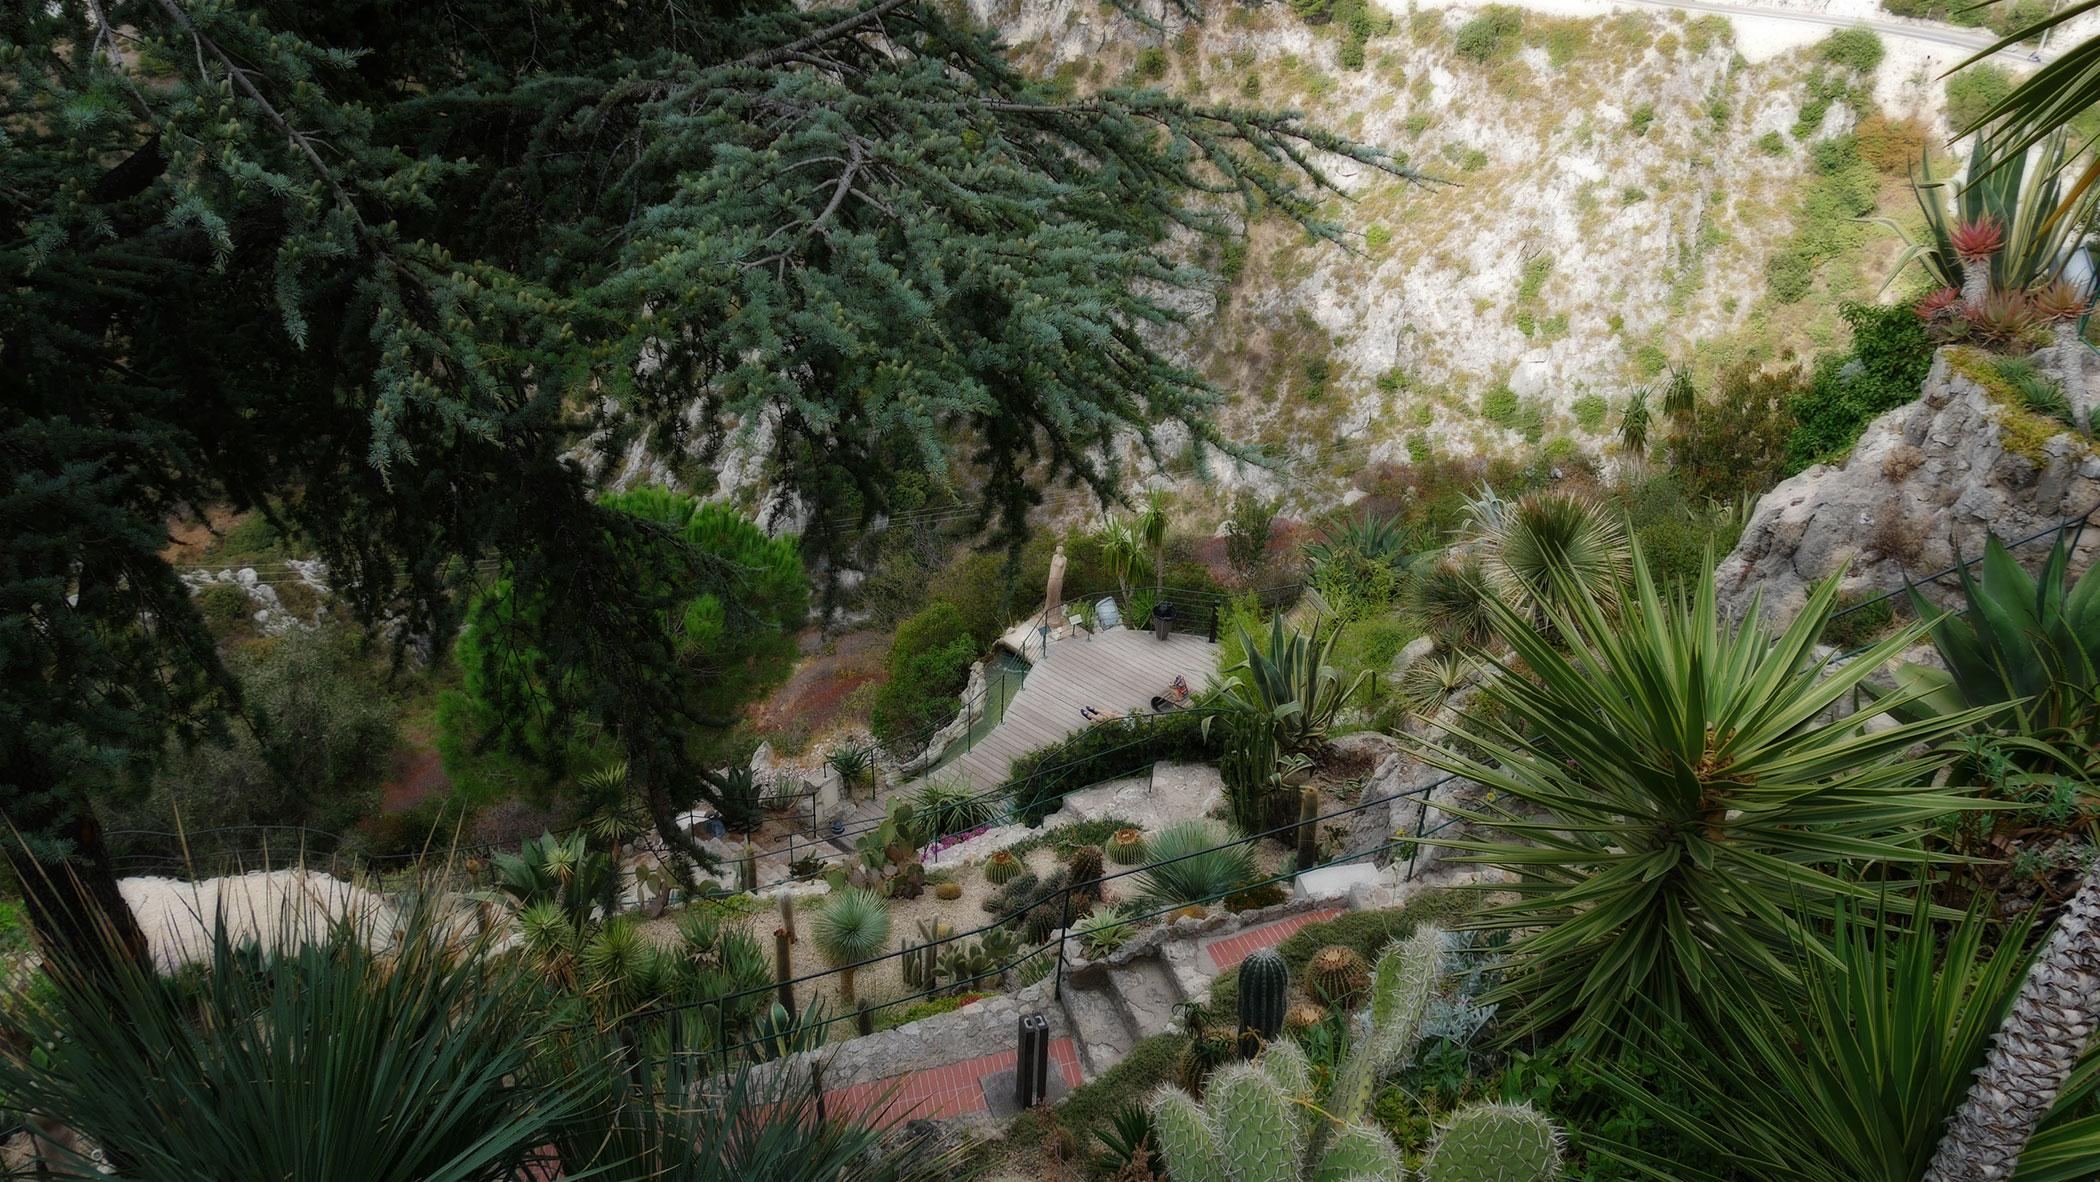 jardin-exotique-de-eze - Provence Guide - Reiseführer, Reisetipps ...